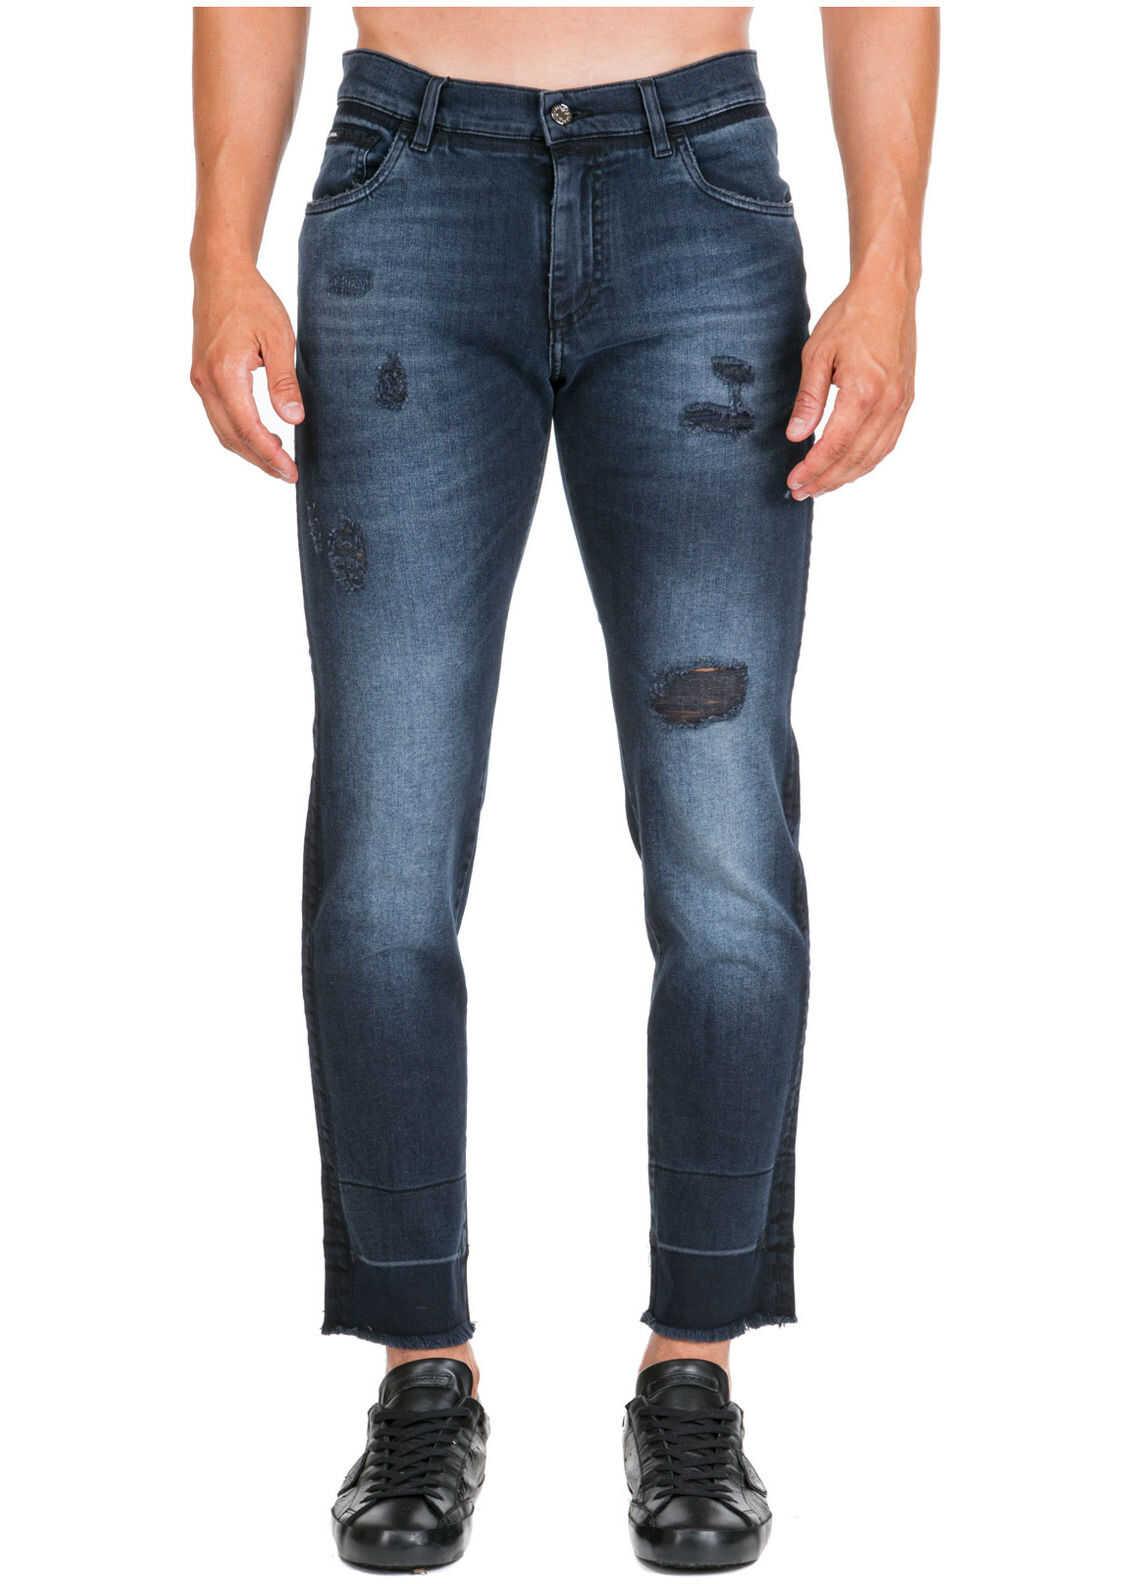 Dolce & Gabbana Jeans Denim Blue